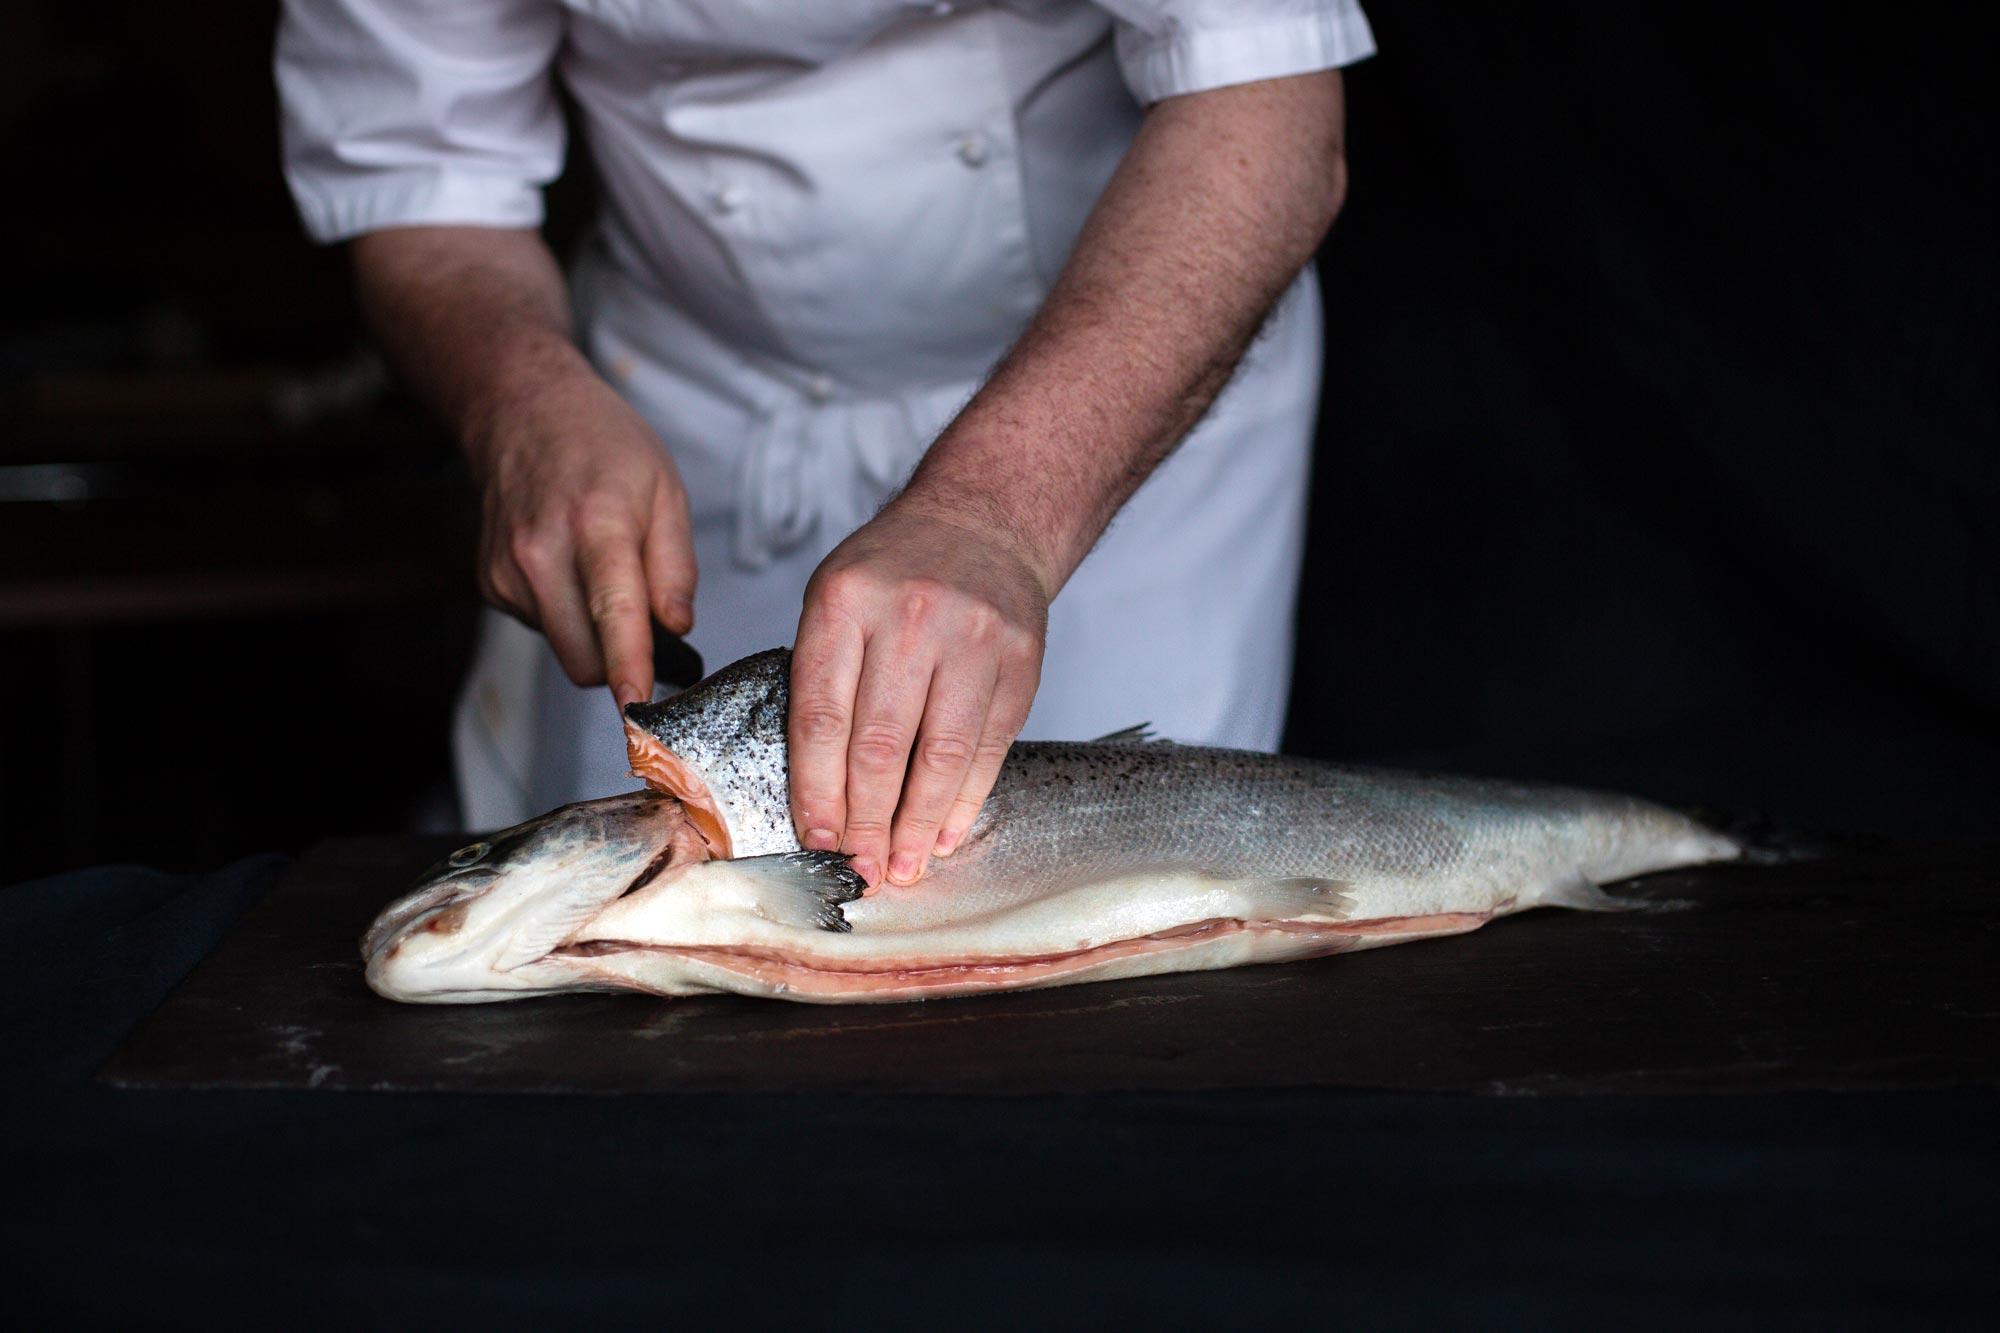 065 Master Chef Web 2019© Anita Murphy 2019_LO.jpg